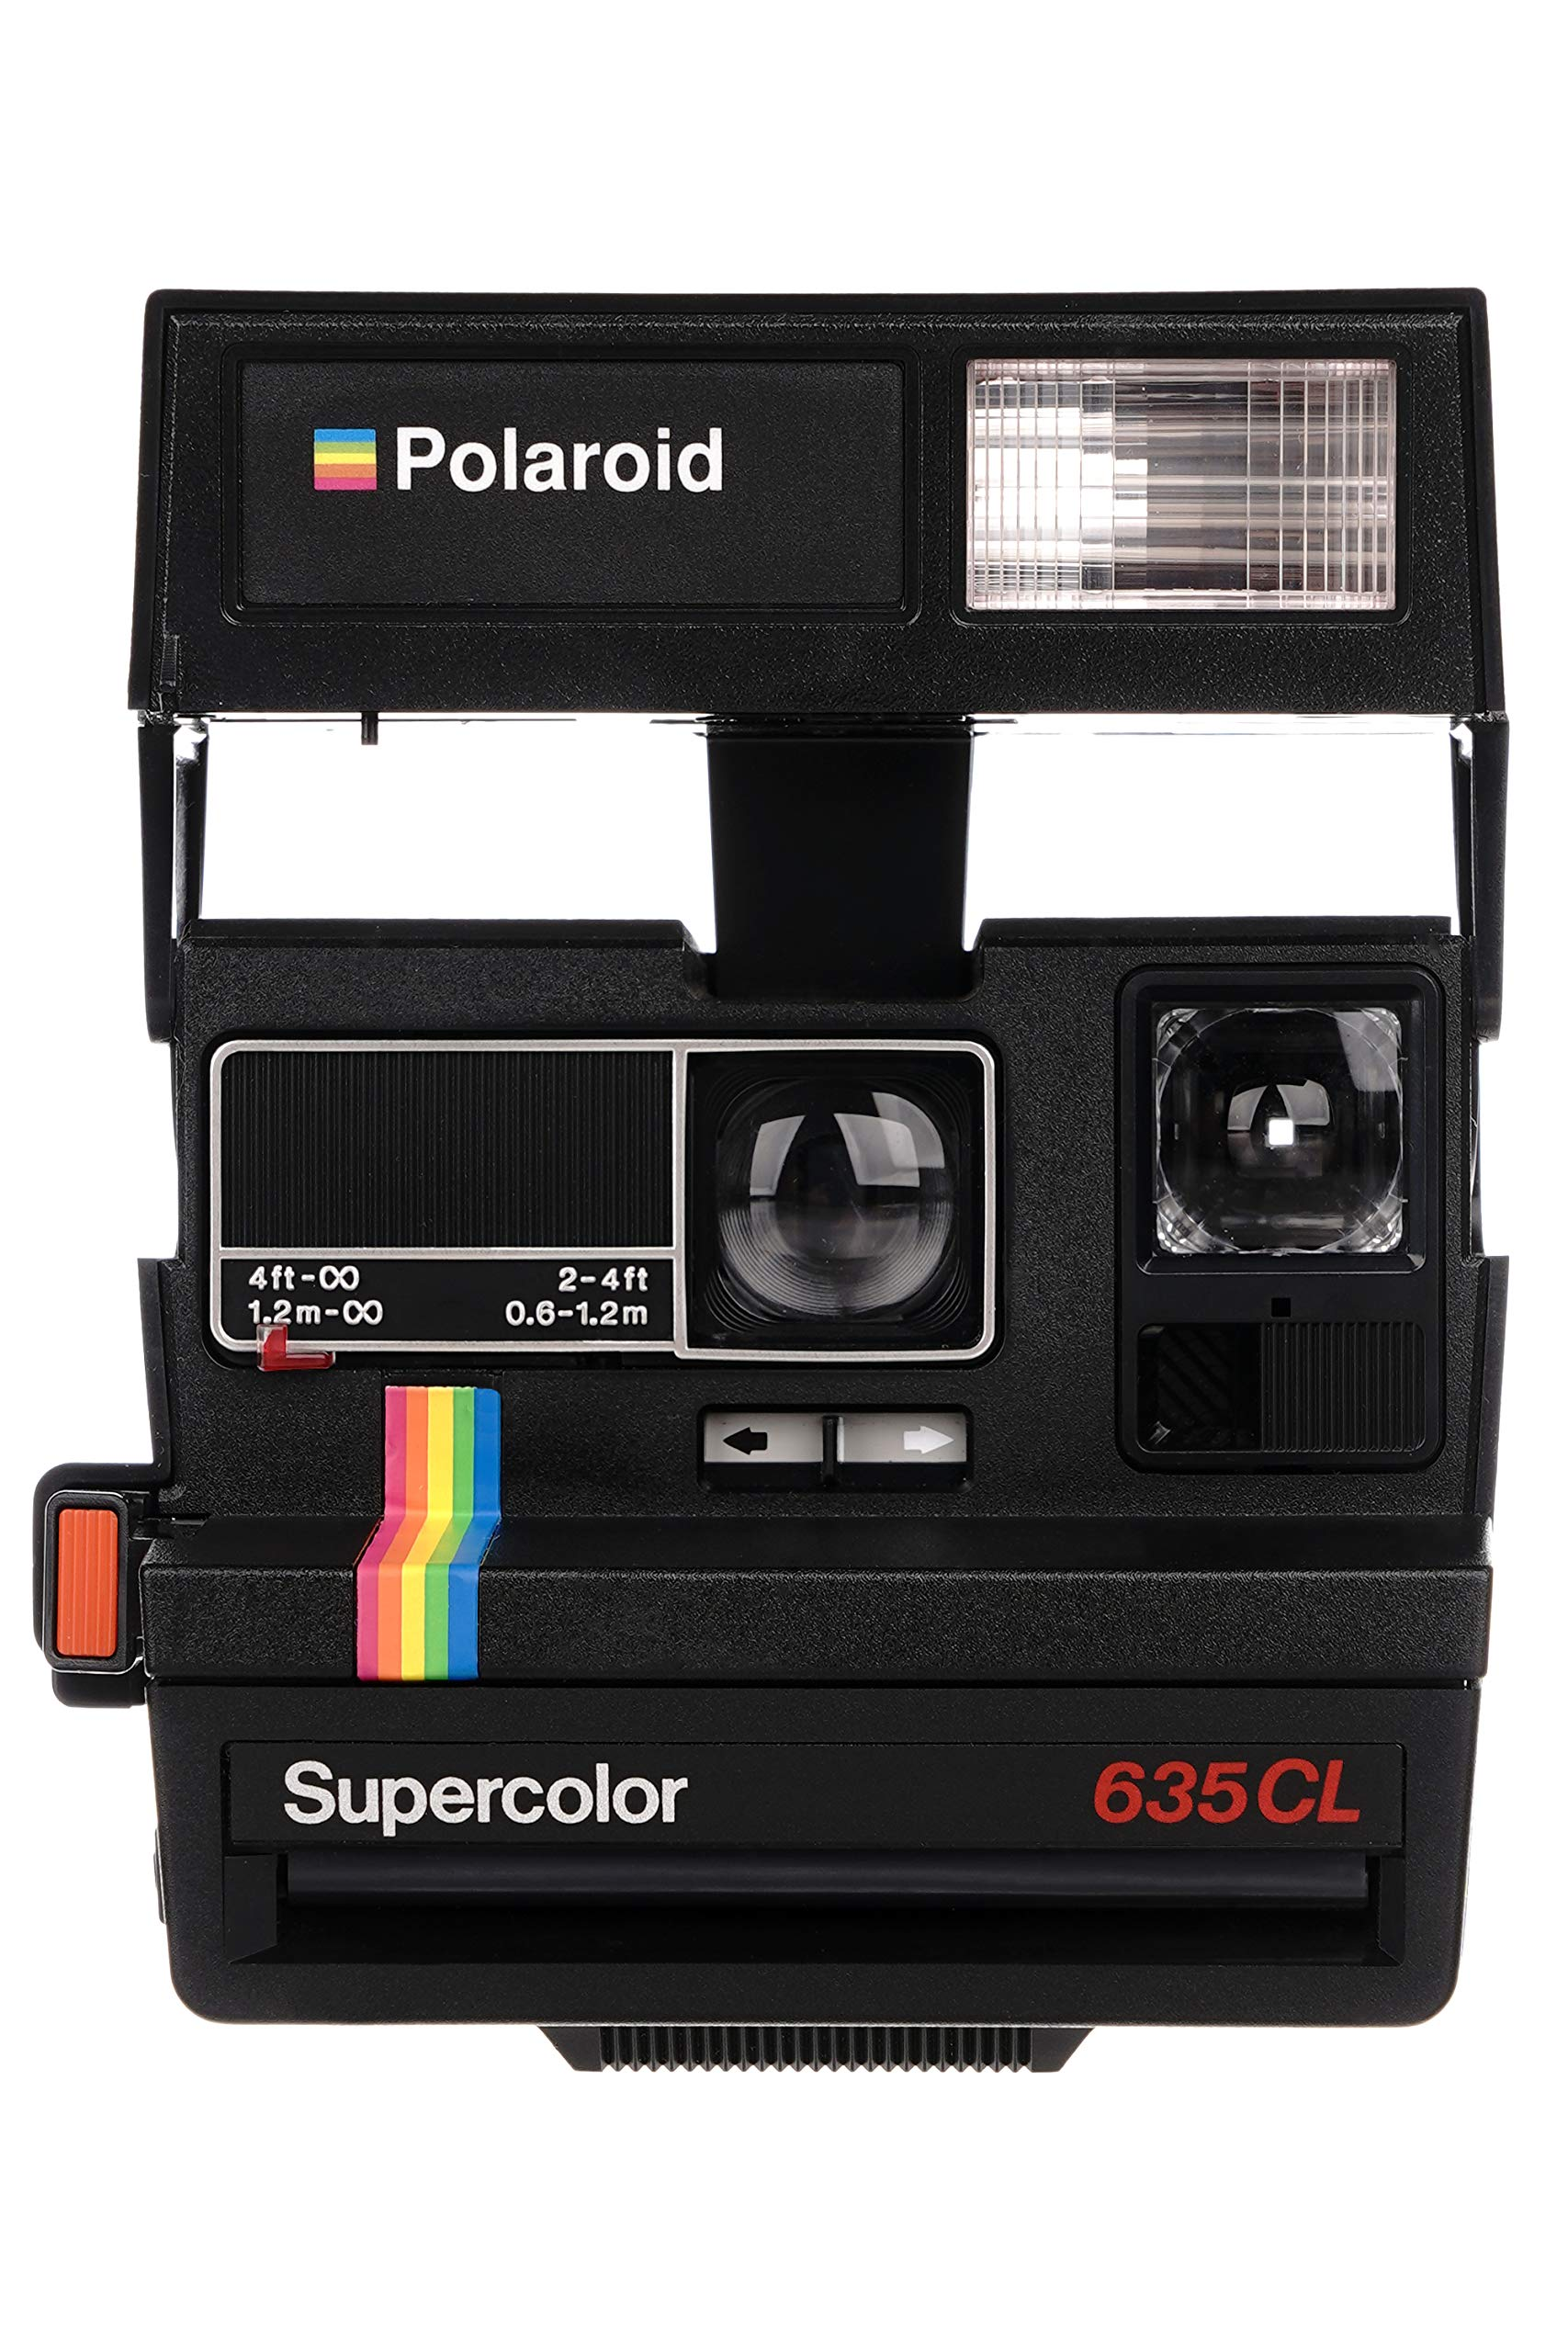 Polaroid 635 CL Supercolor Instant camera